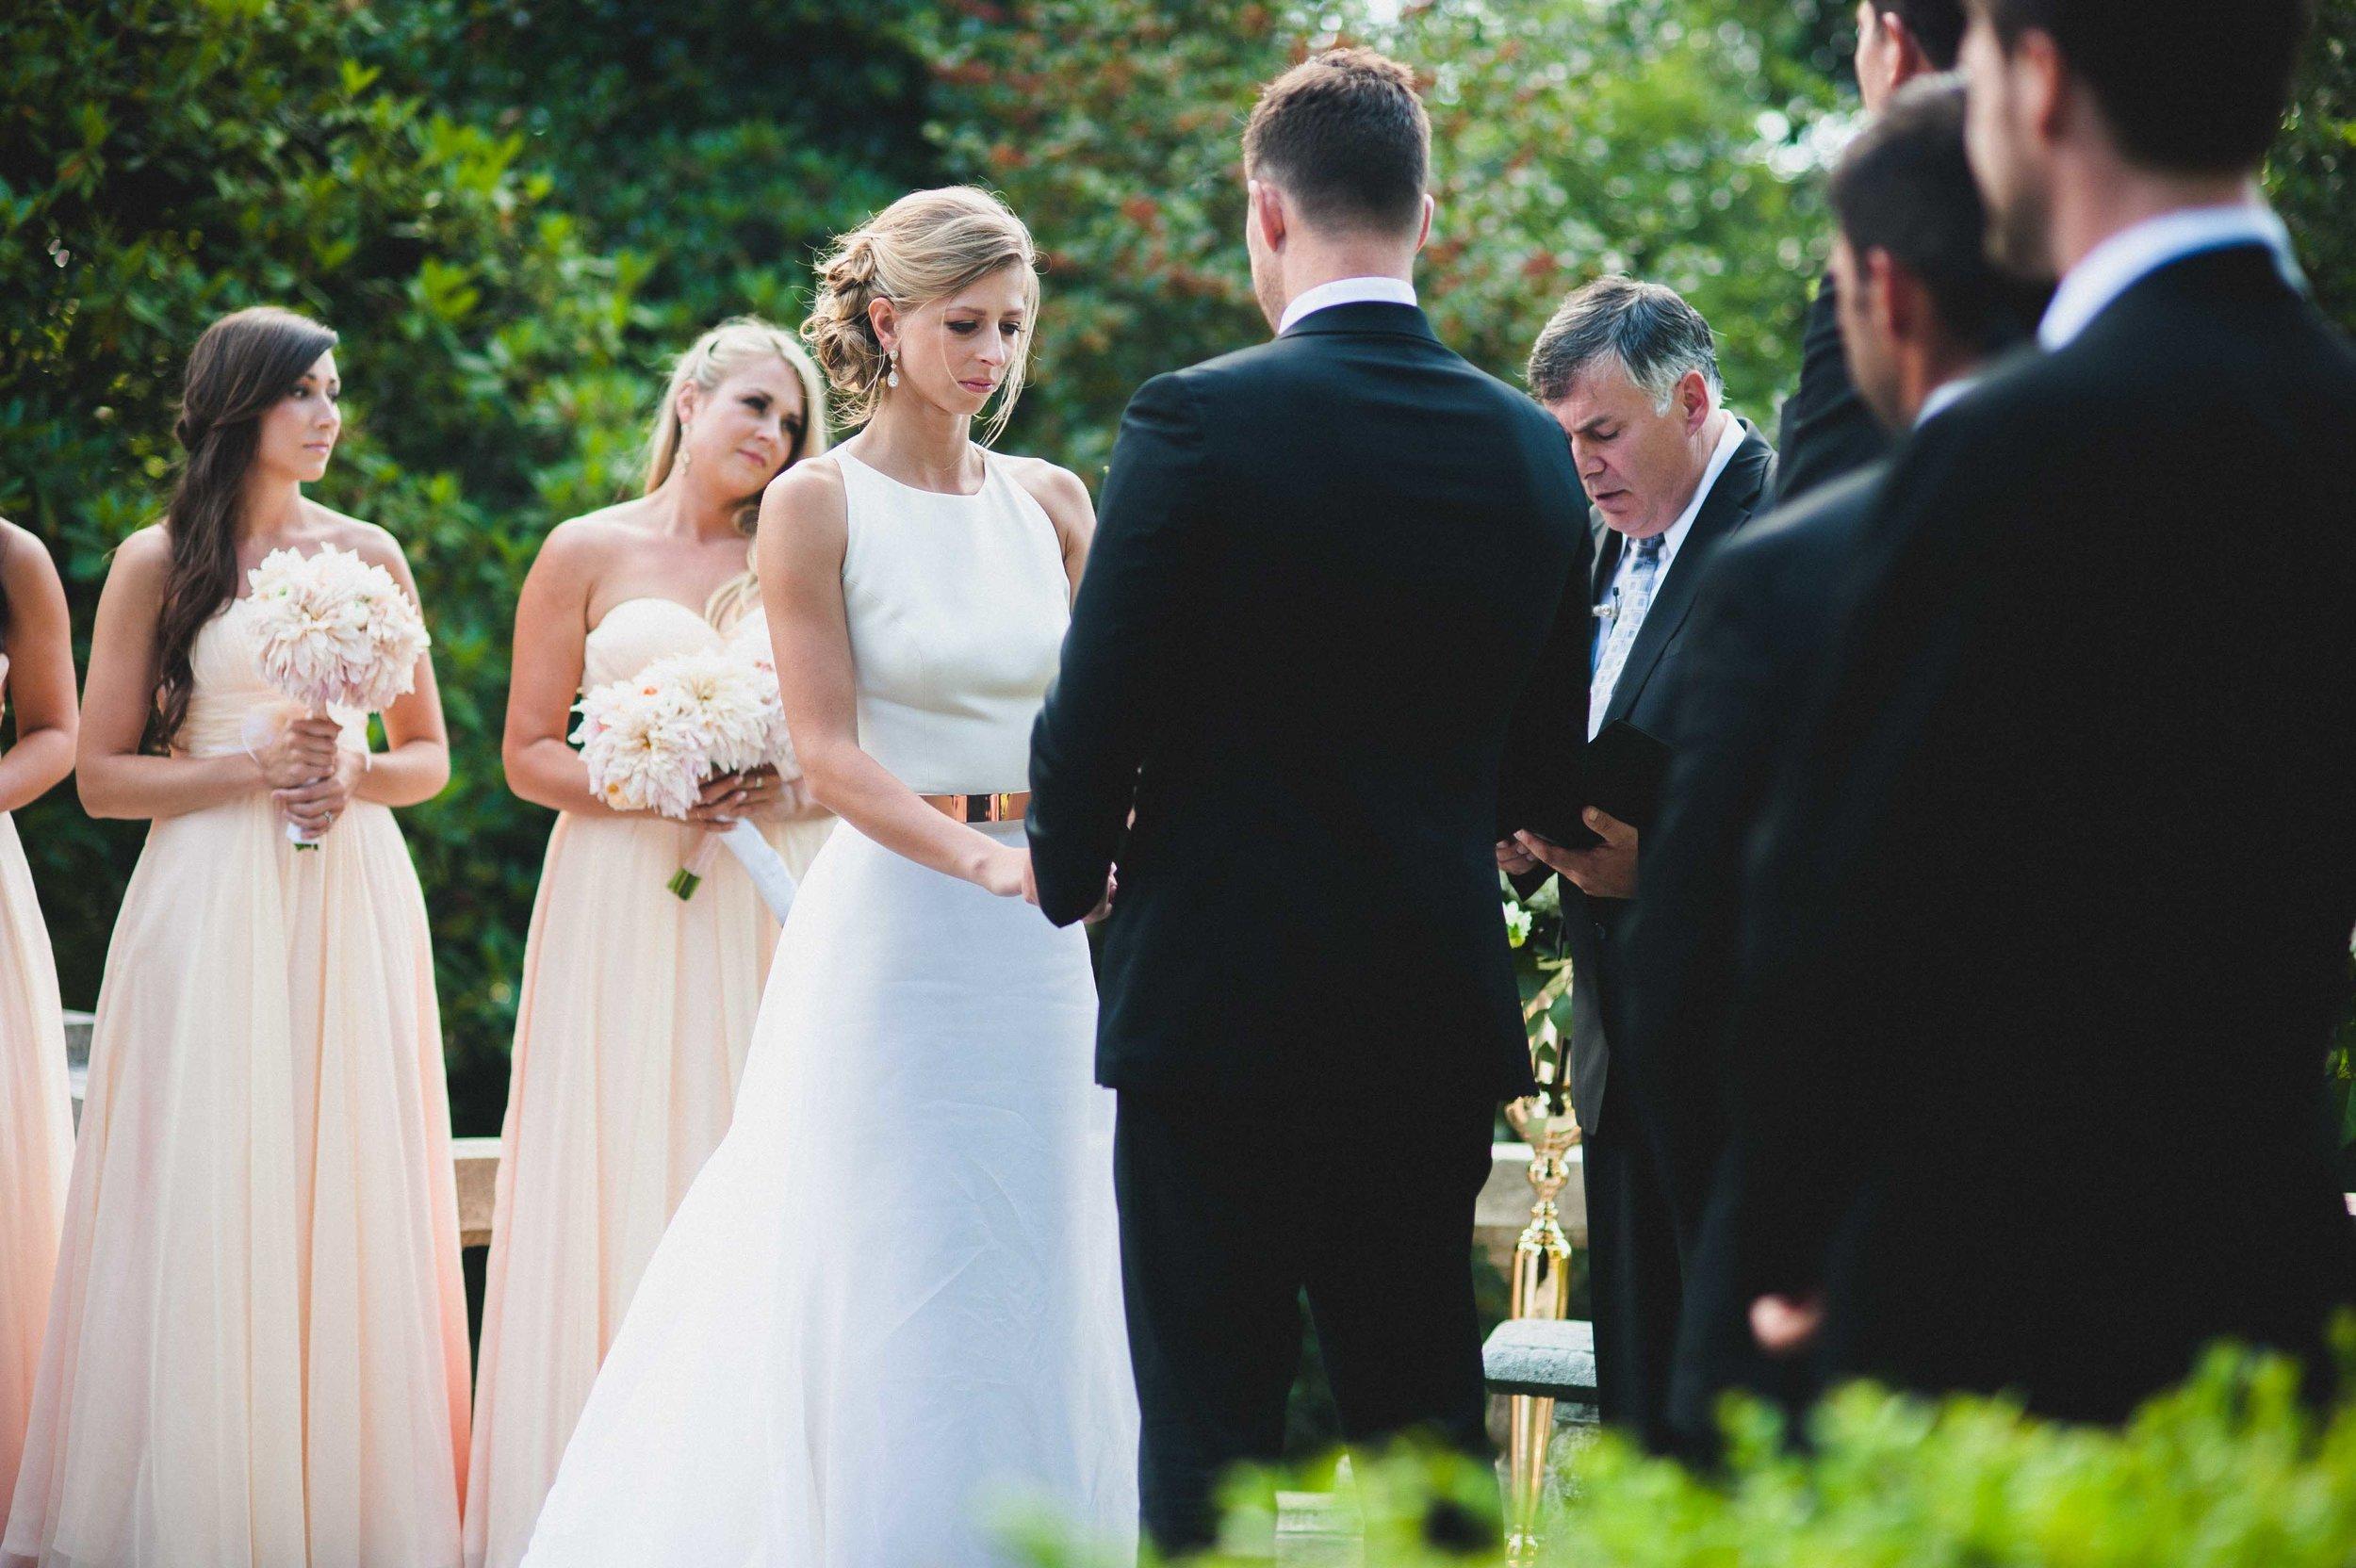 vancouver-hycroft-wedding-photographer-edward-lai-photography-5.jpg